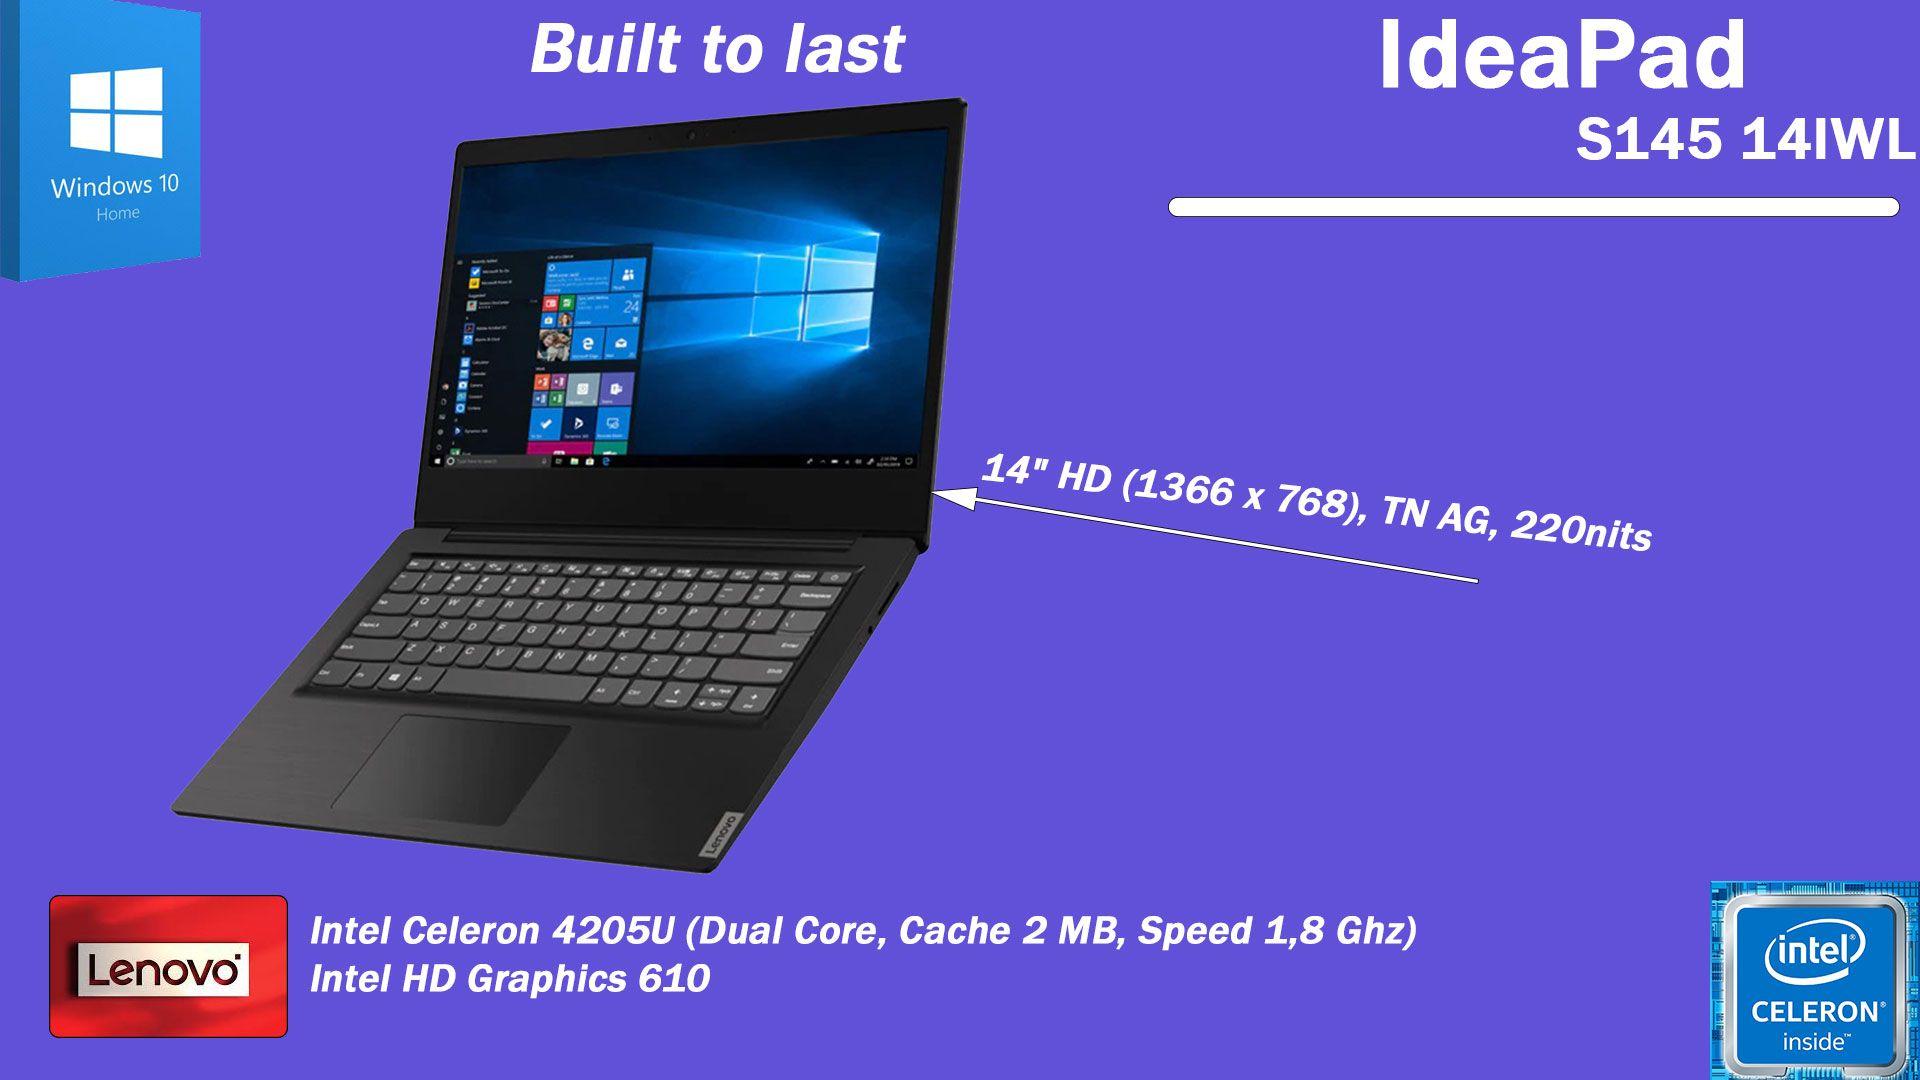 Spesifikasi Lenovo Ideapad S145 Harga Murah Mahasiswa Di 2020 Mahasiswa Windows 10 Dvd